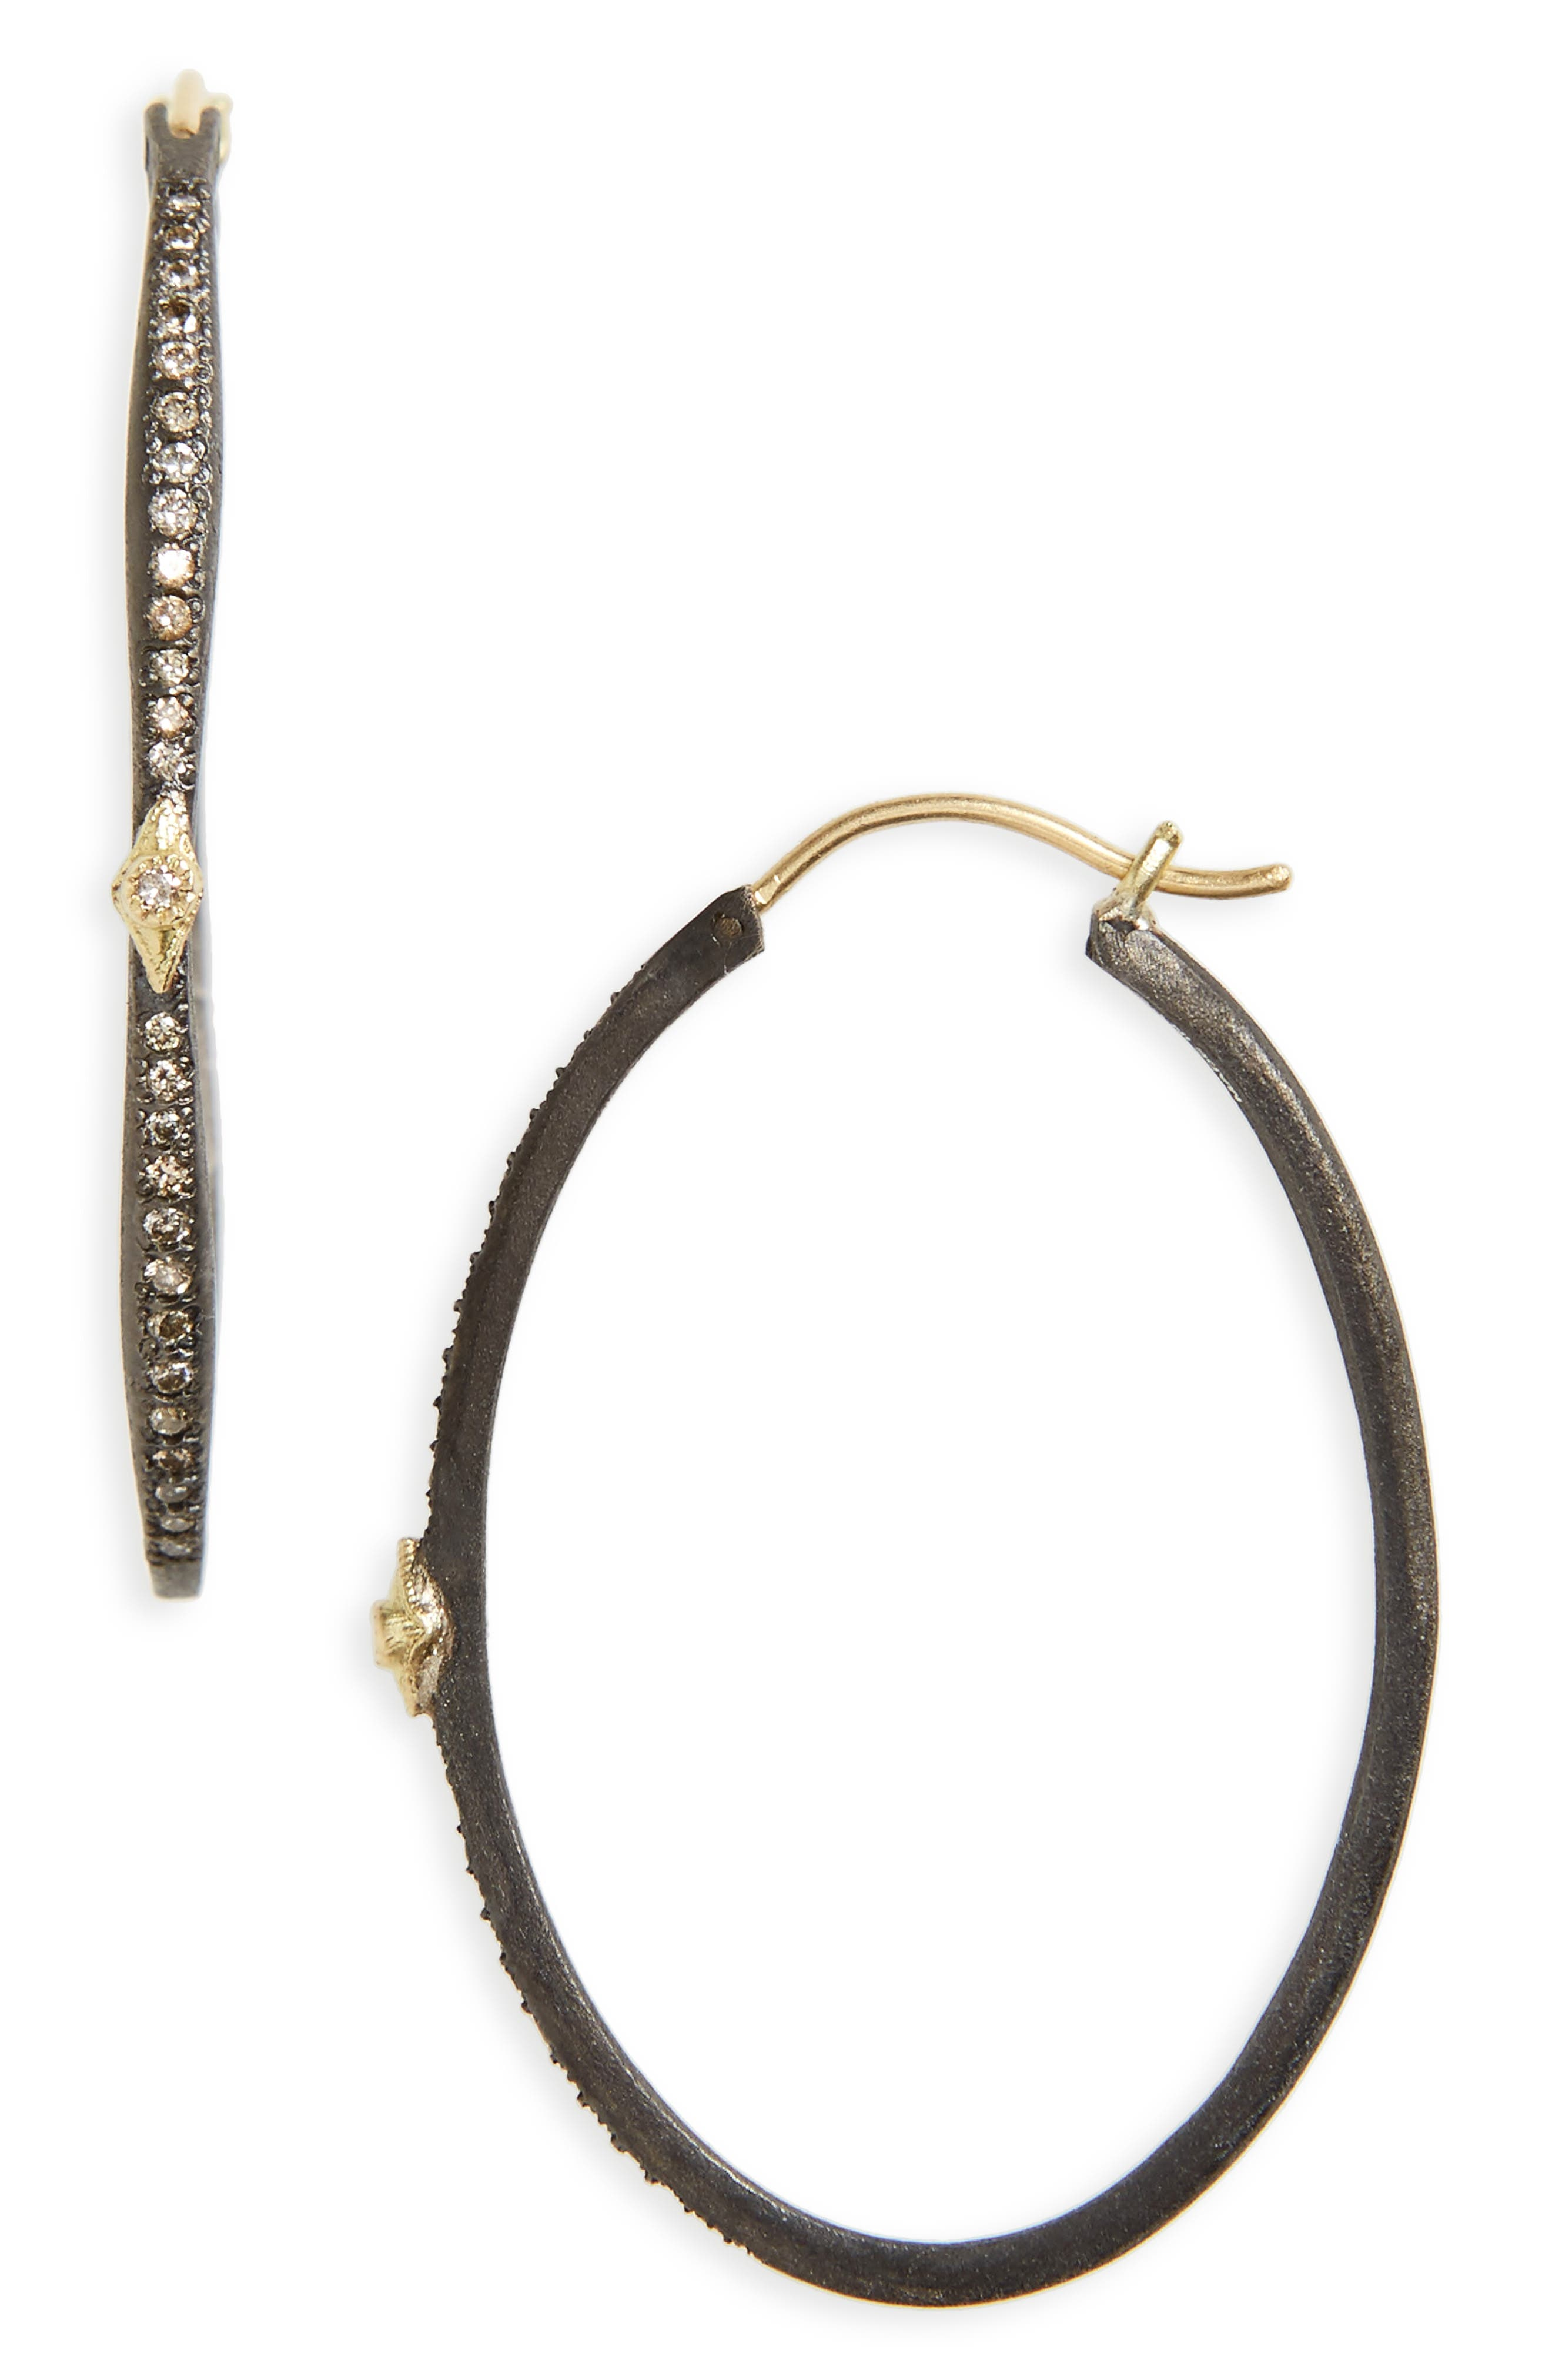 Old World Oval Hoop Earrings,                         Main,                         color, BLACKENED SILVER